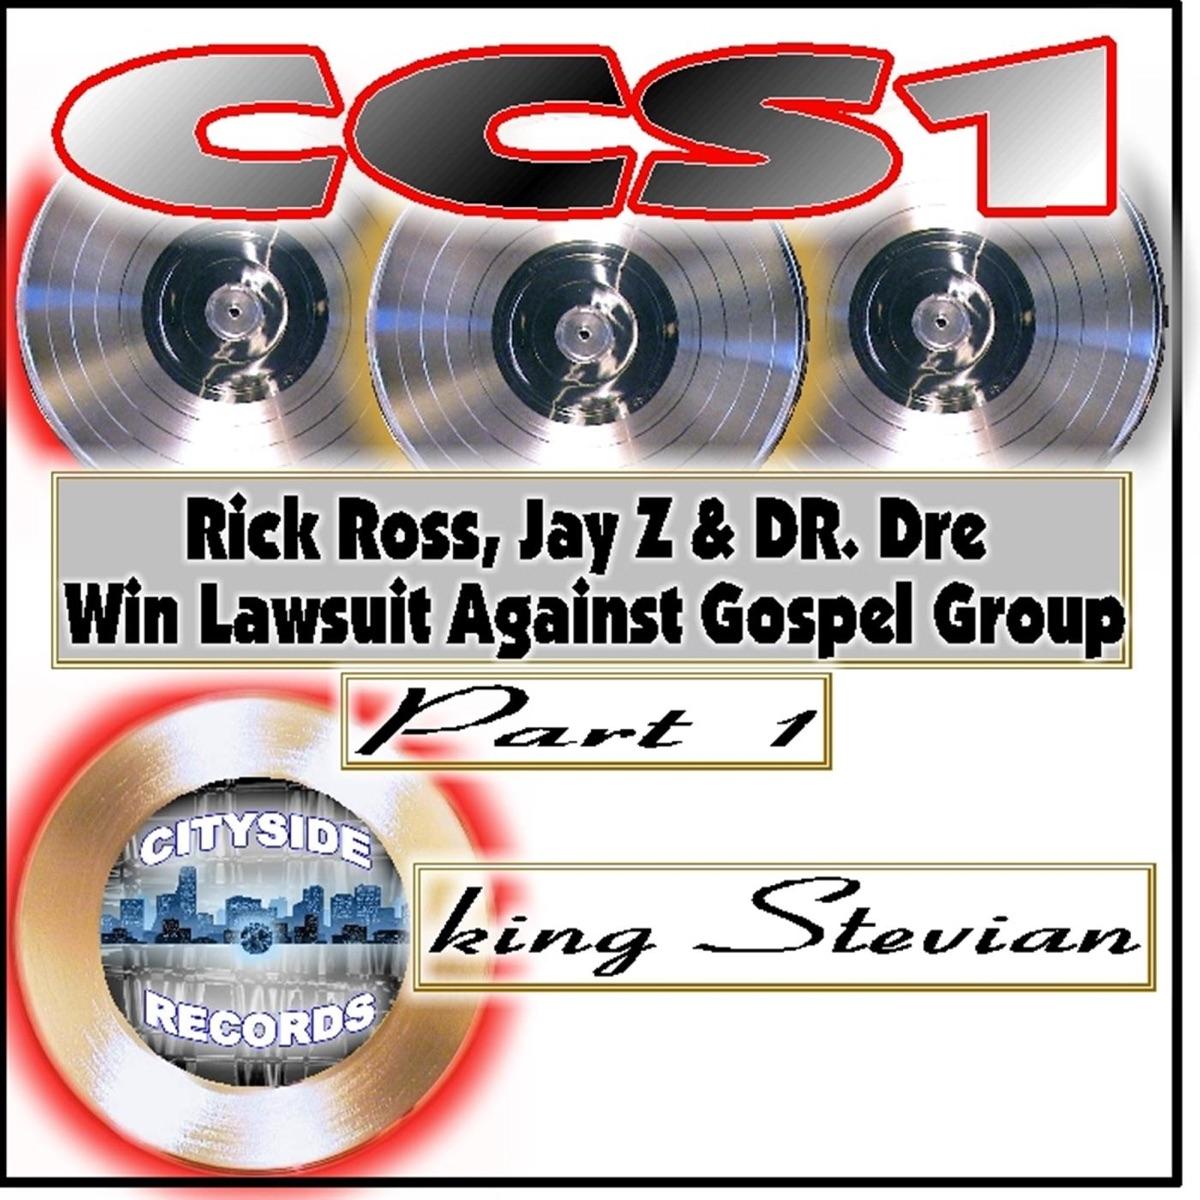 Ccs1 Rick Ross Jay Z  DR Dre Win Lawsuit Against Gospel Group Pt 1 feat Christian Cartel - Single King Stevian CD cover